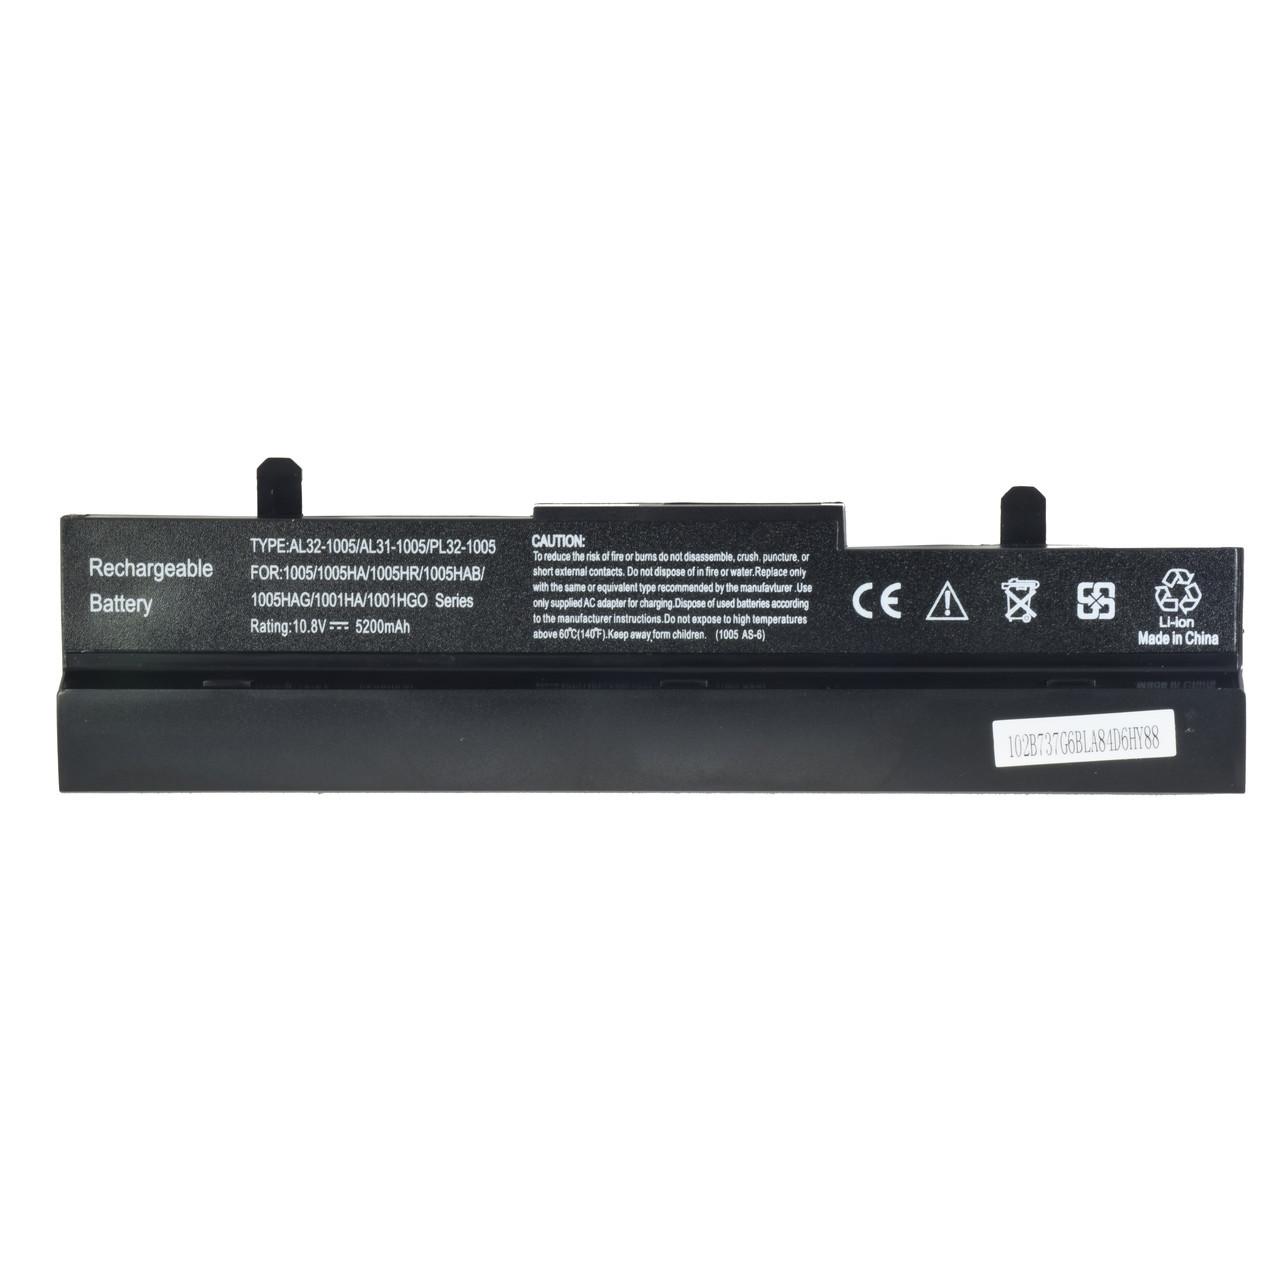 Батарея для ноутбука ASUS Eee PC  1005PXD 1101HA 1101HA-M 1101HA-MU1X 1101HA-MU1X-BK 1101HGO